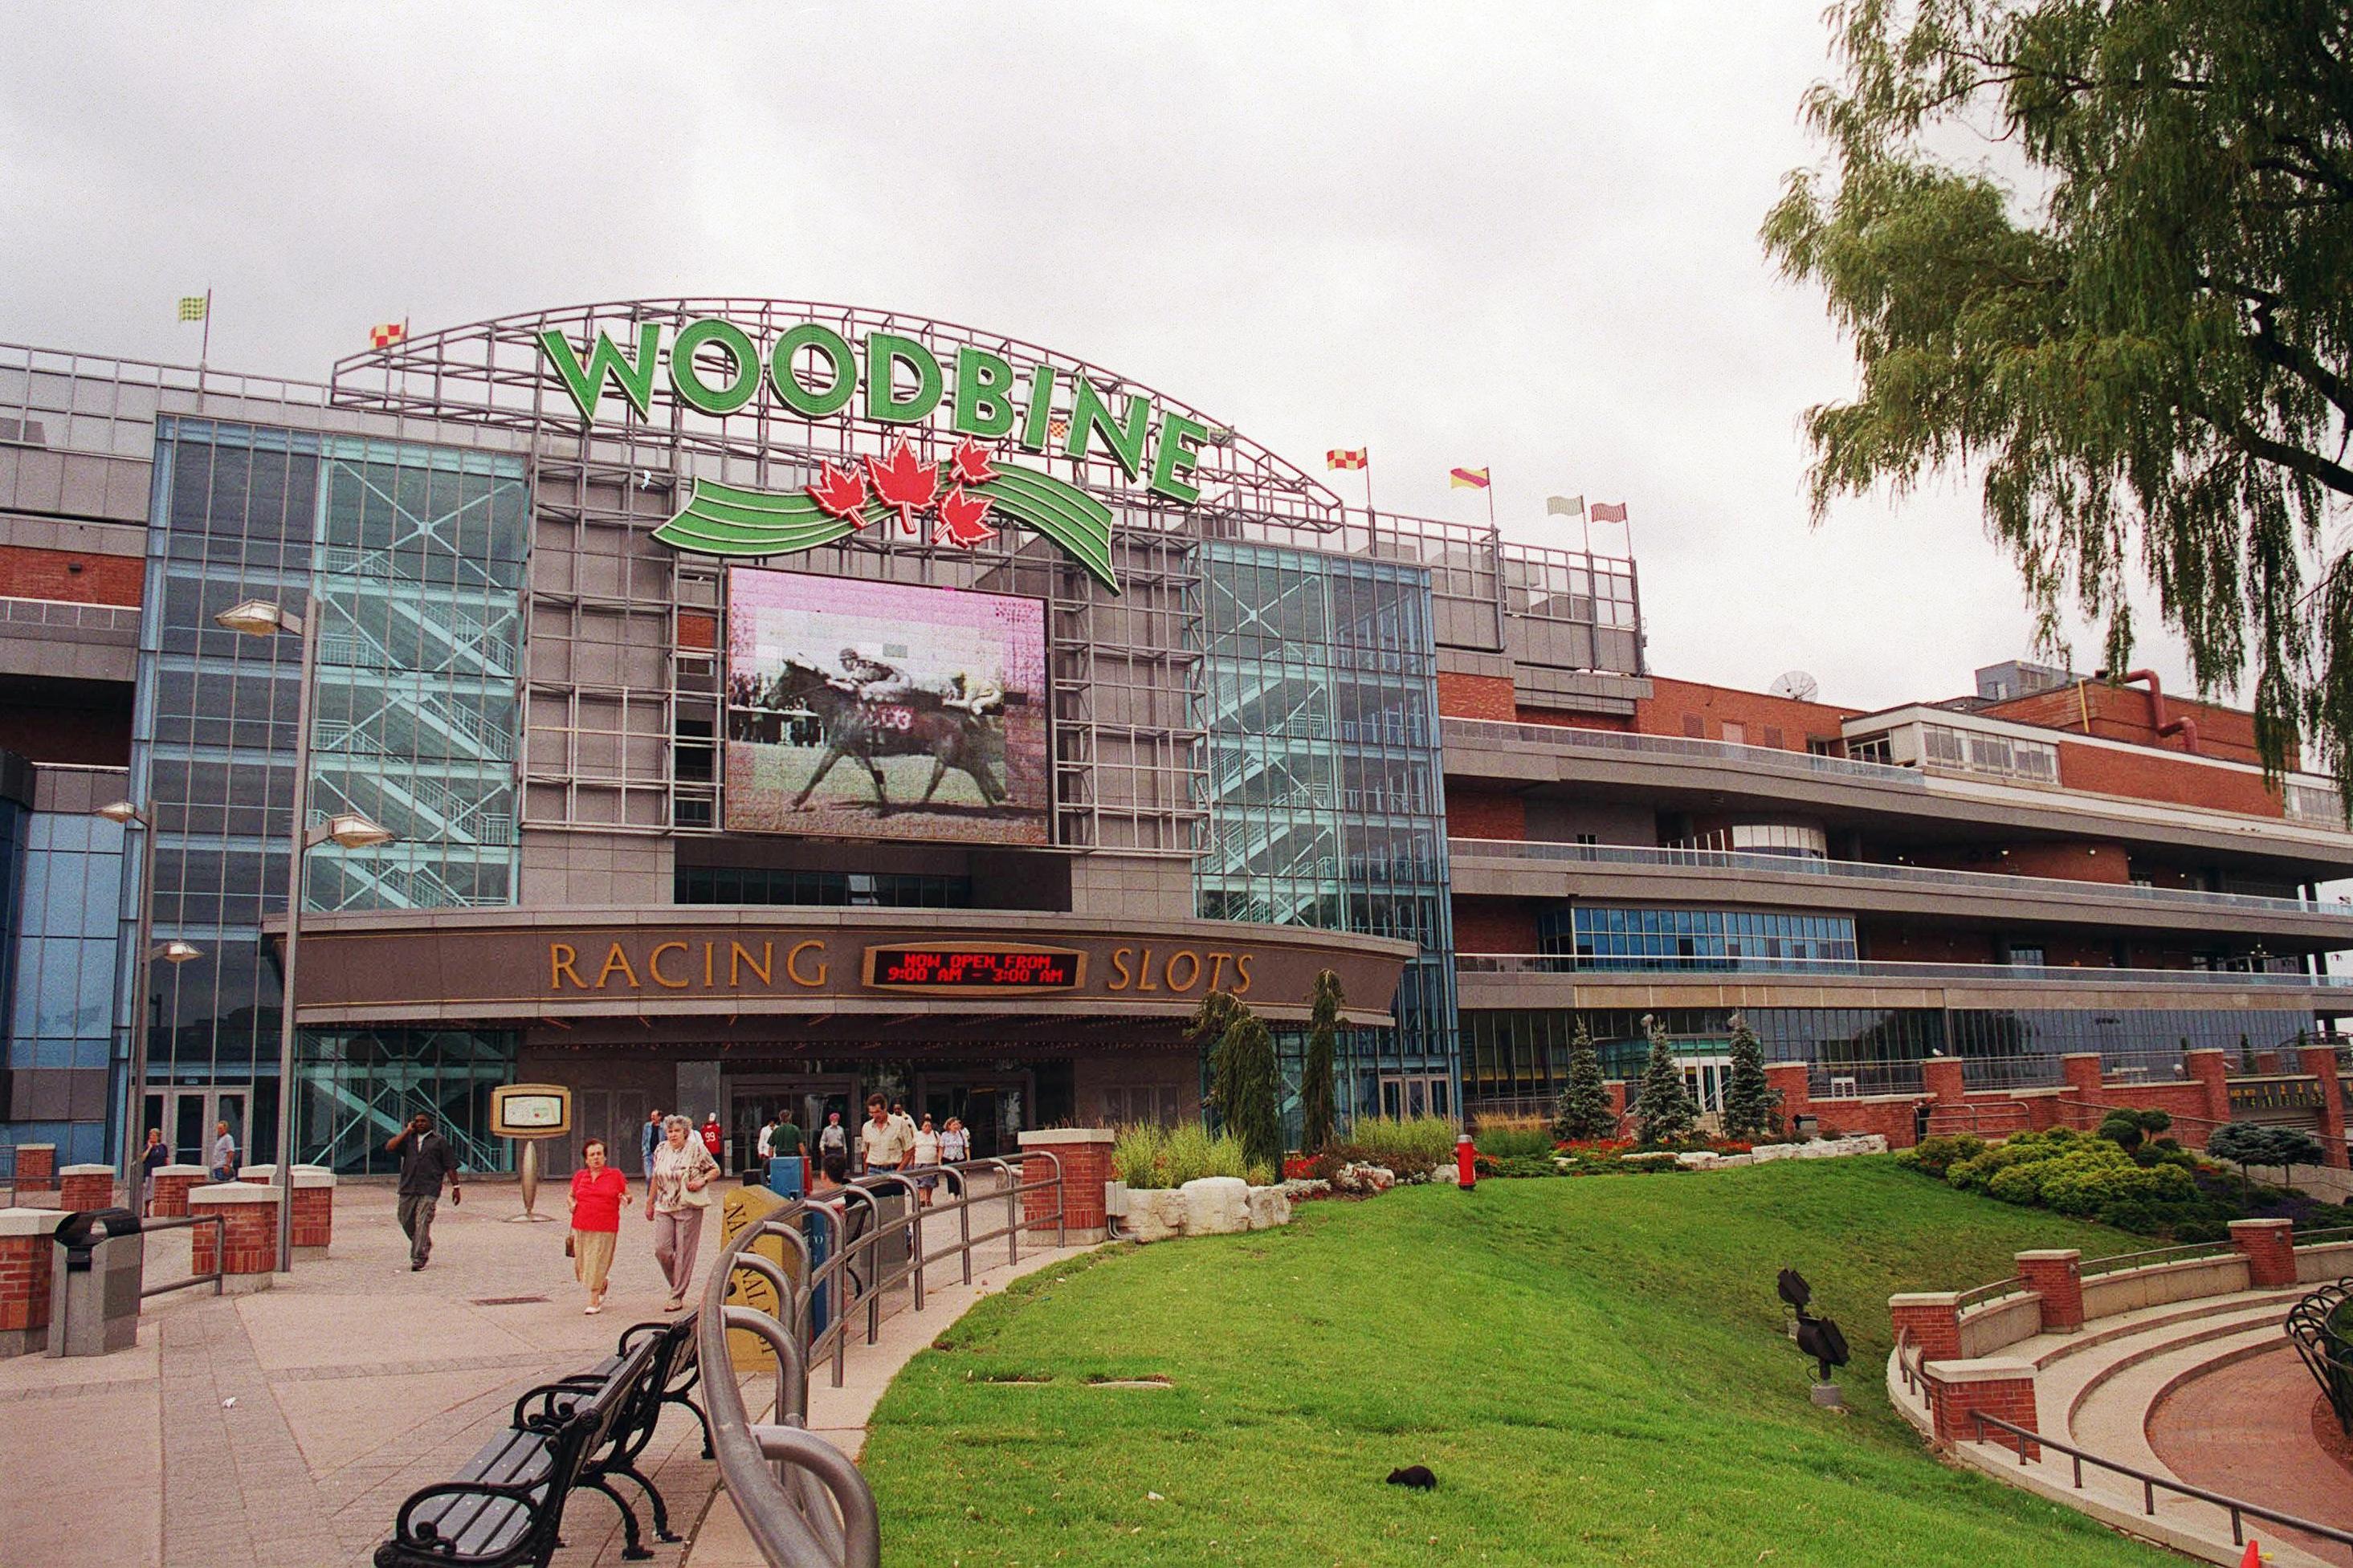 Woodbine casino employment indian reservation gambling new york